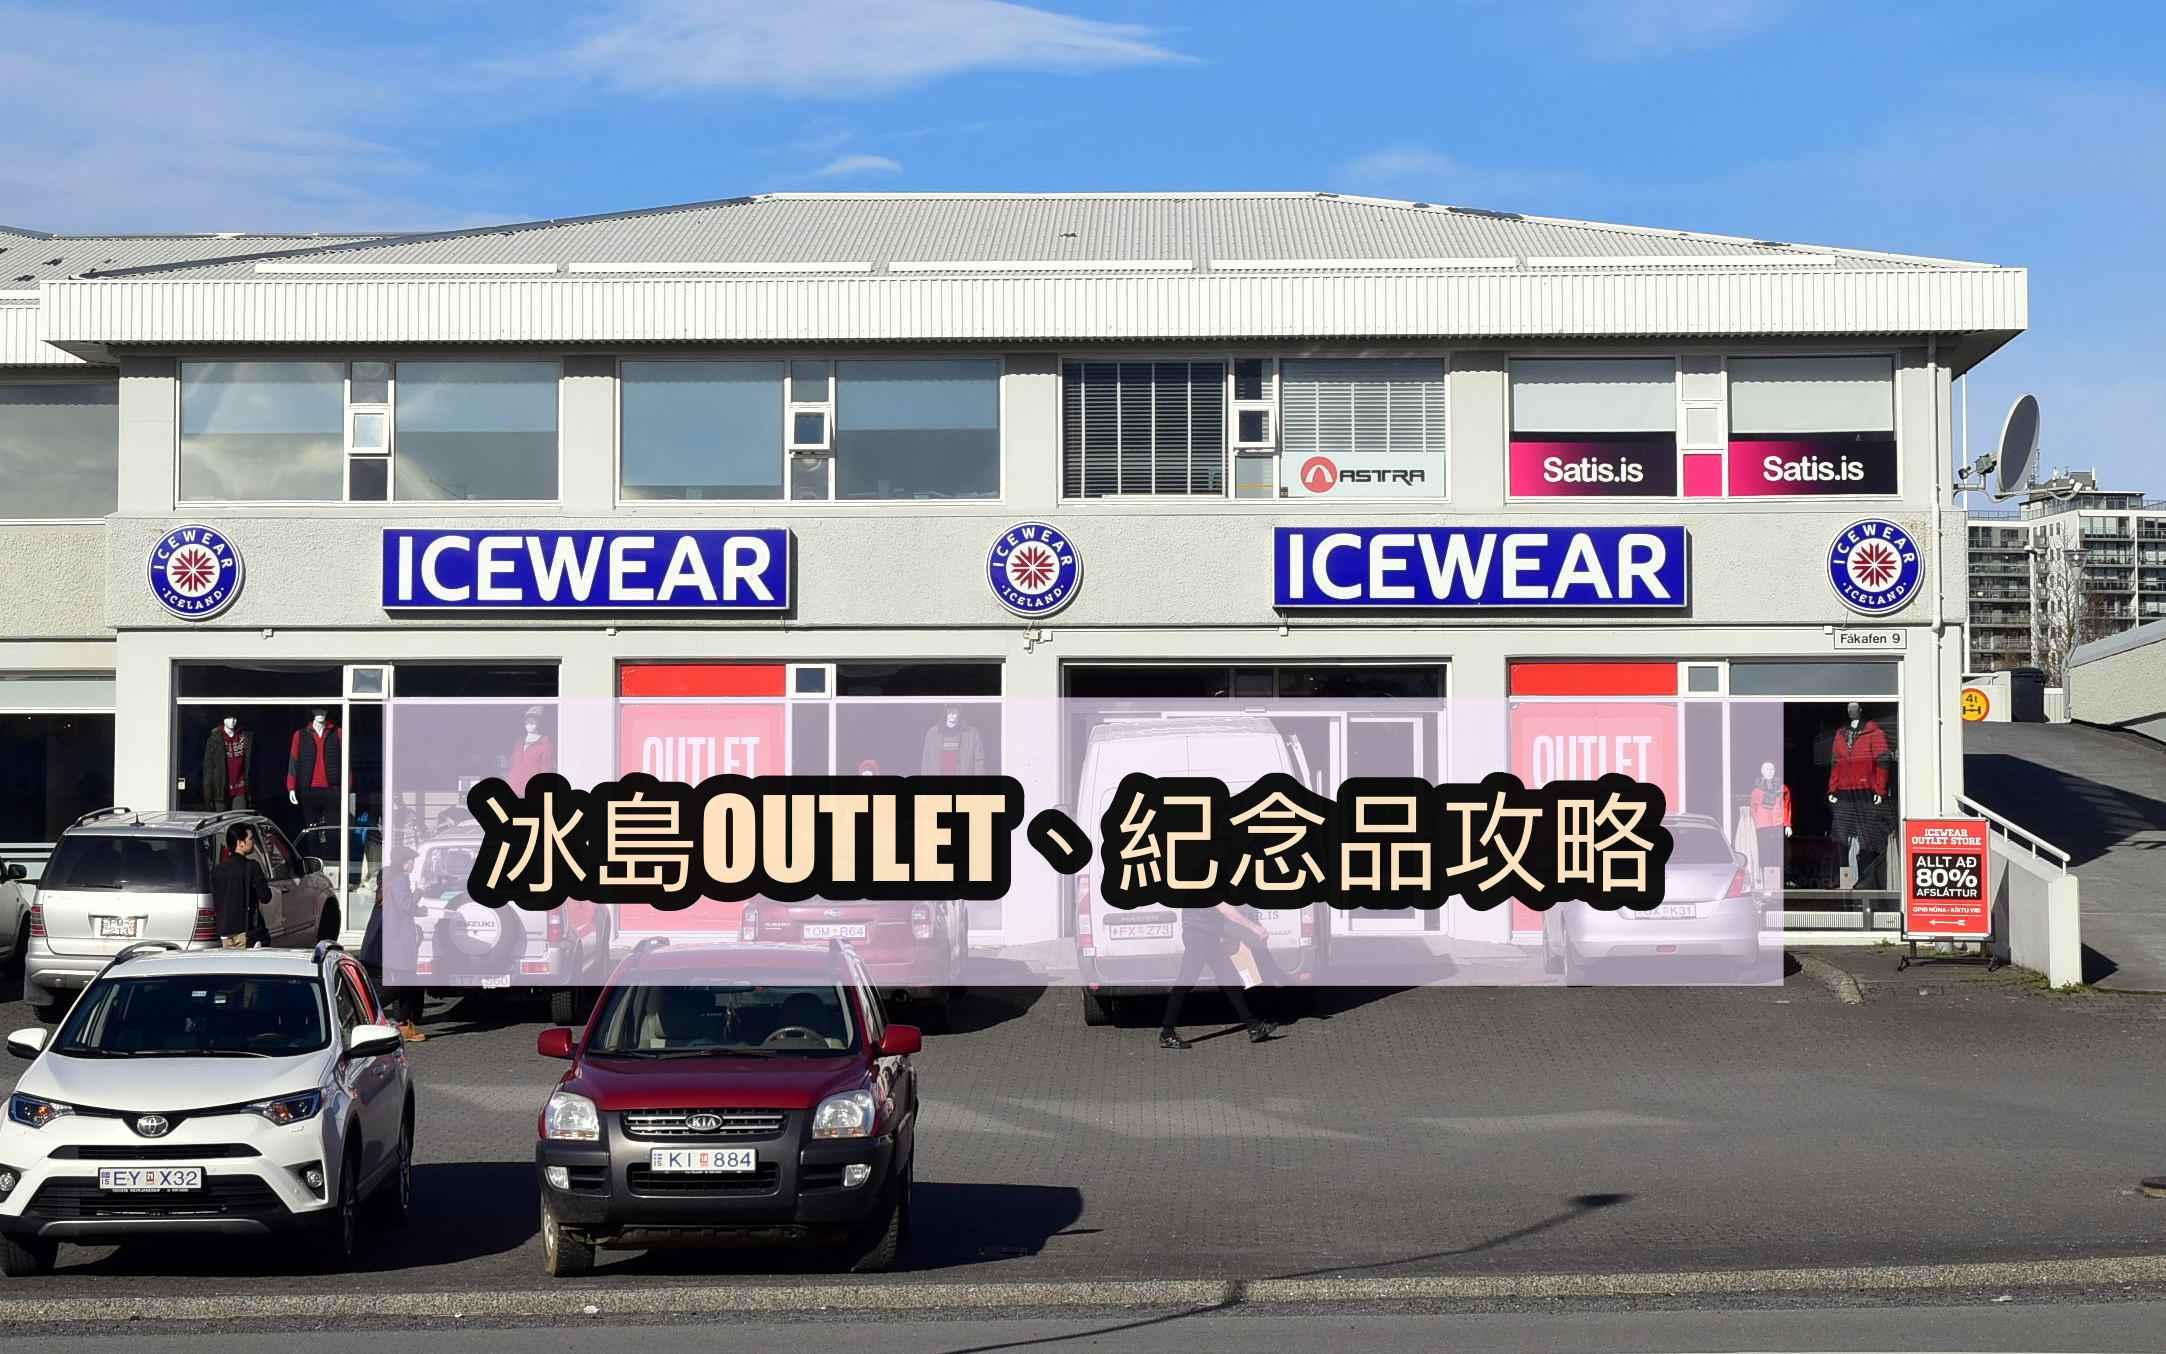 66°NORTH OUTLET,ICEWEAR OUTLET,冰島OUTLET必買,冰島紀念品必買選擇,冰島紀念品,冰島必買,冰島必買推薦 @Nash,神之領域